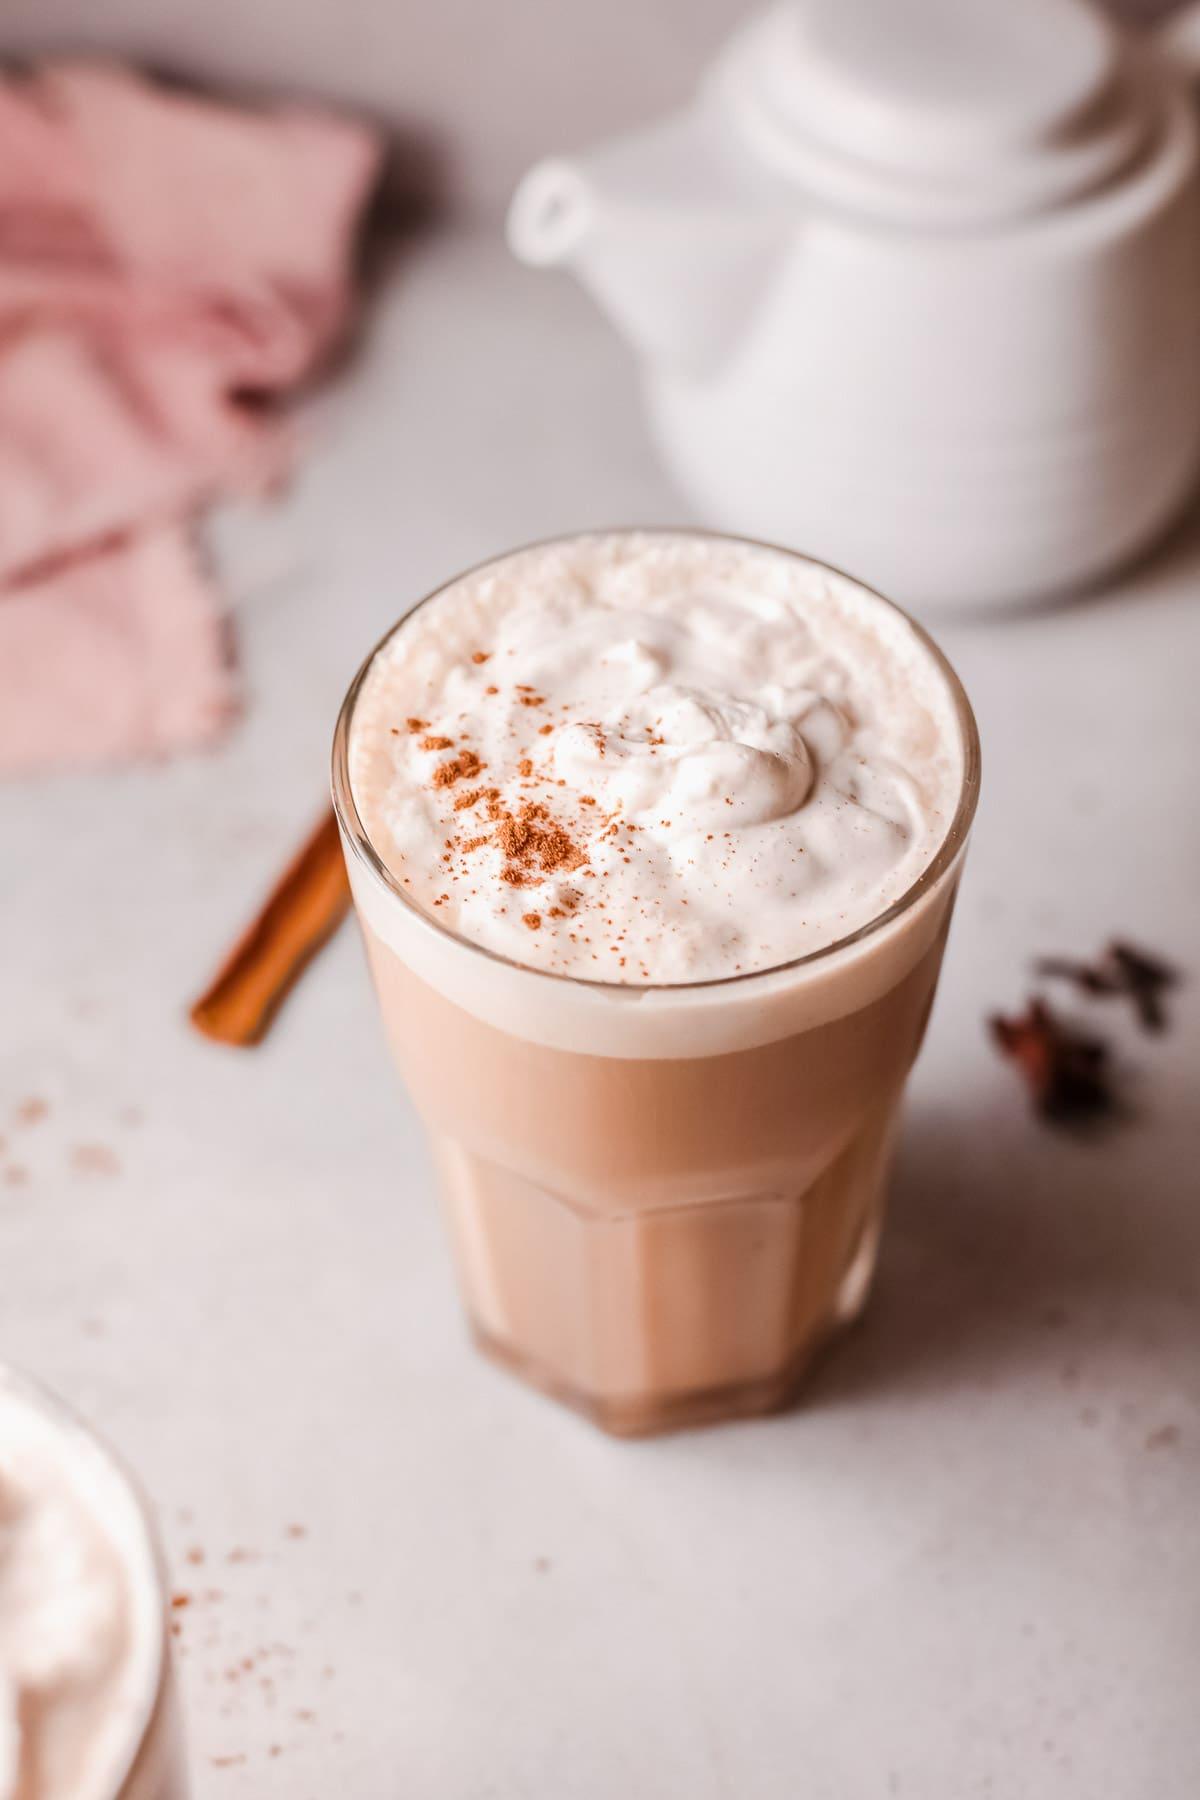 Chai latte with cinnamon